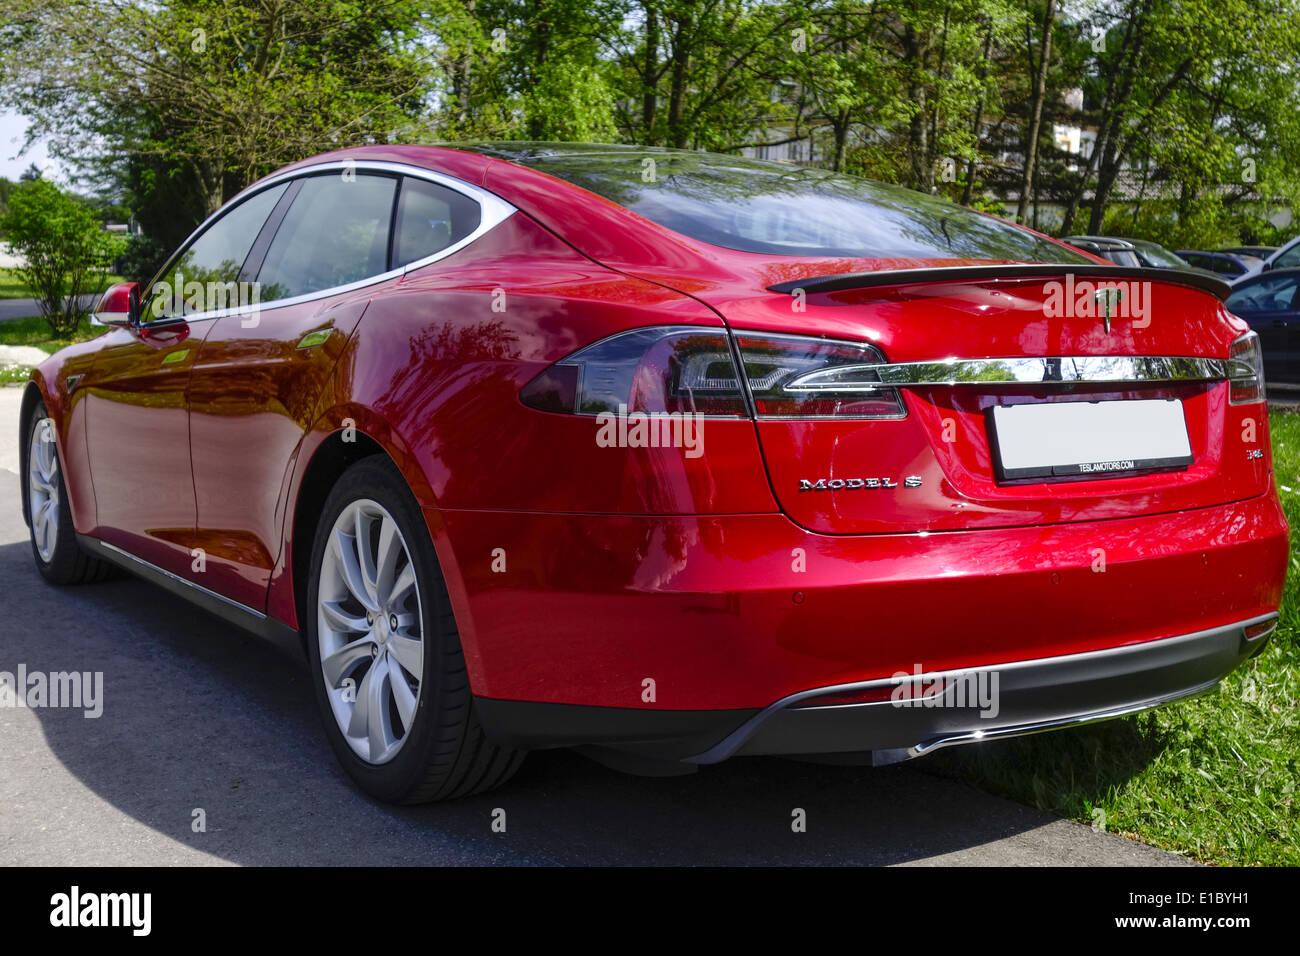 Roter Tesla Model S P85, ein Luxus-Elektroauto - Stock Image